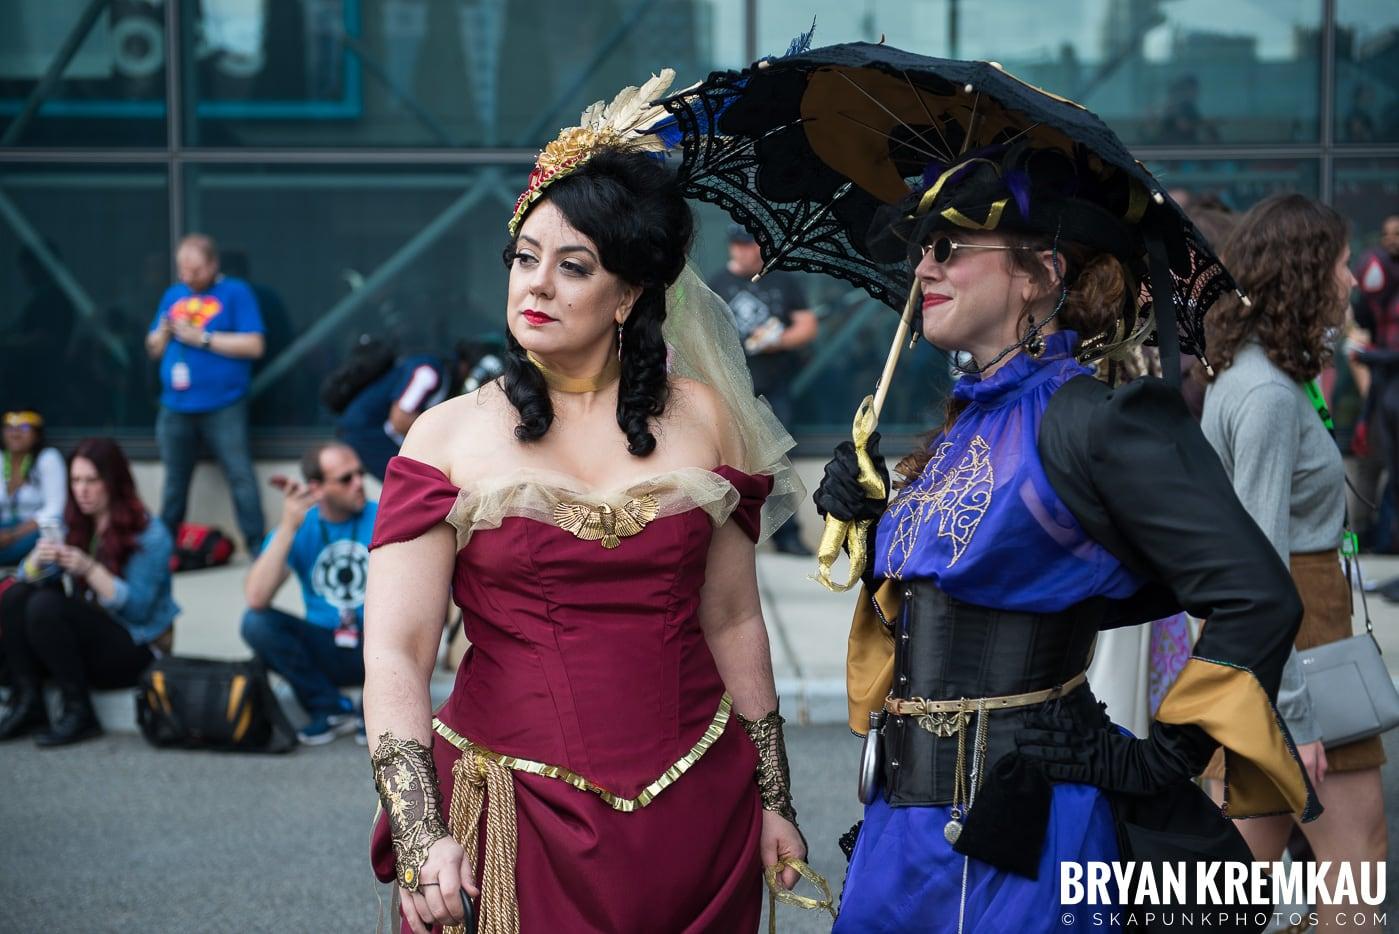 New York Comic Con 2018: Friday - 10.5.18 (64)